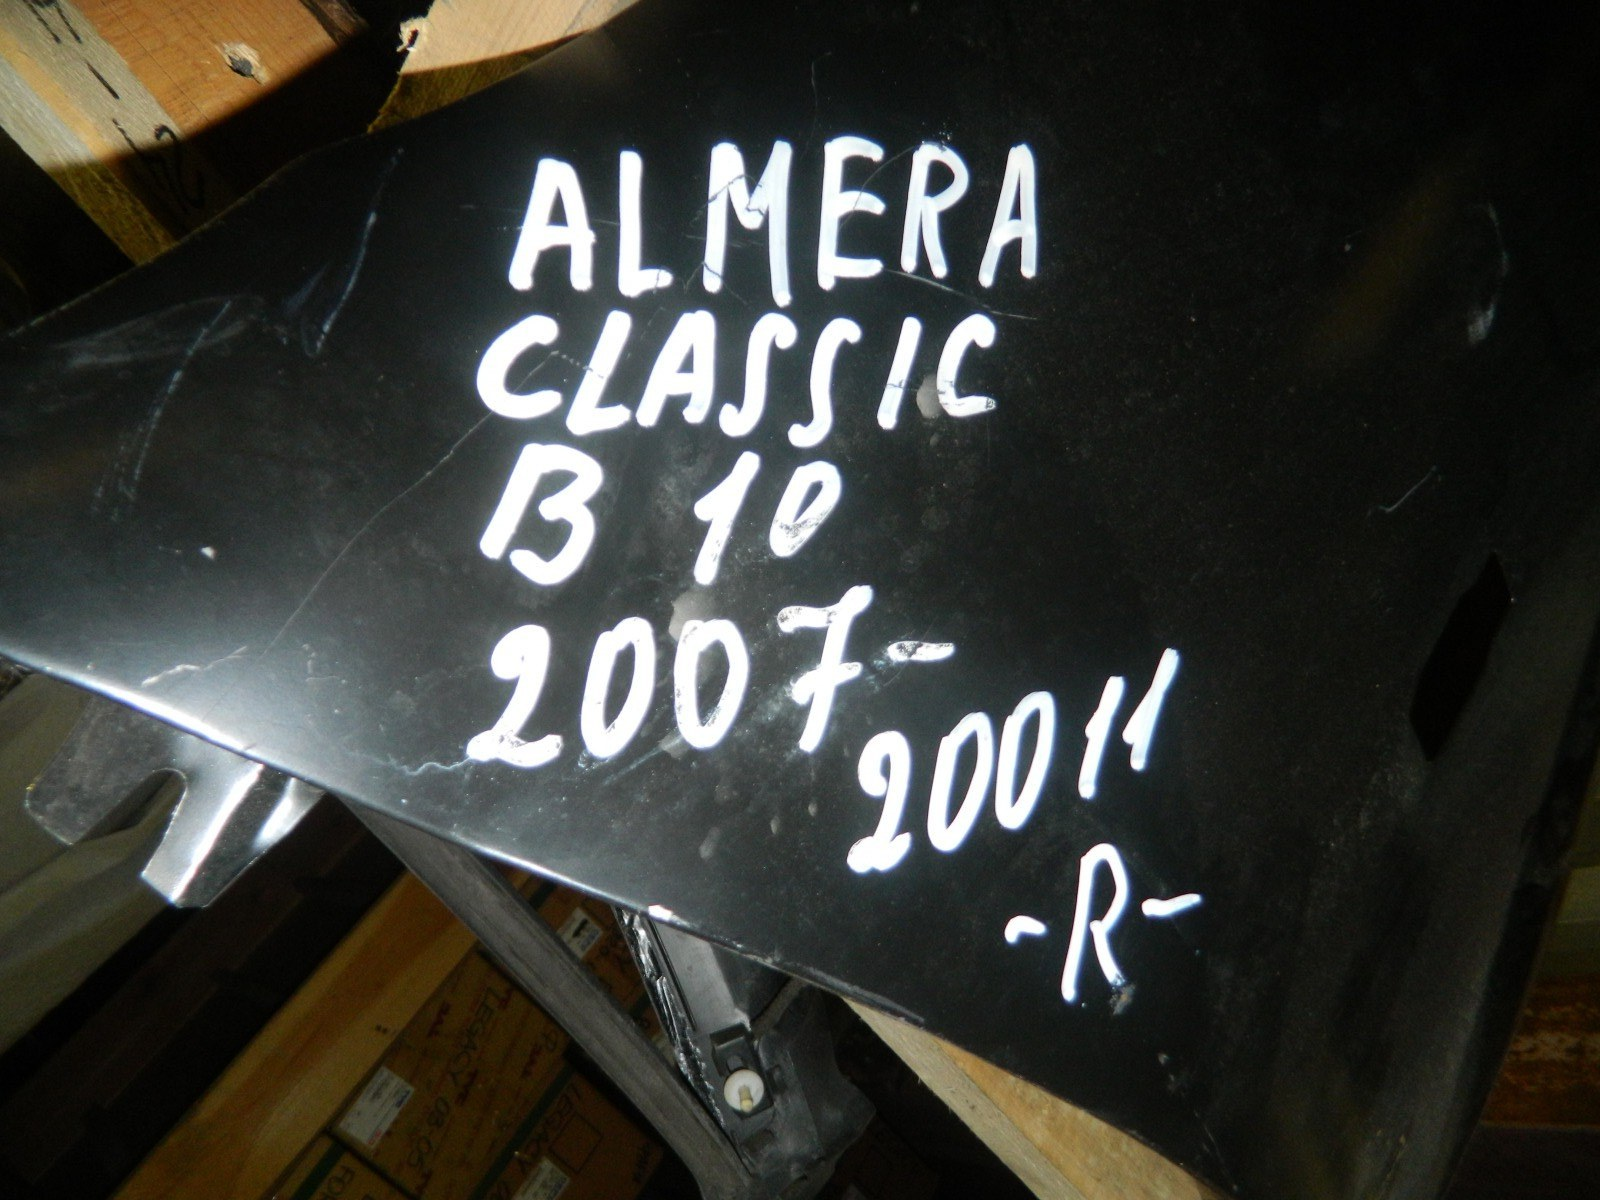 Крыло Nissan Almera Classic B10 2007 правое